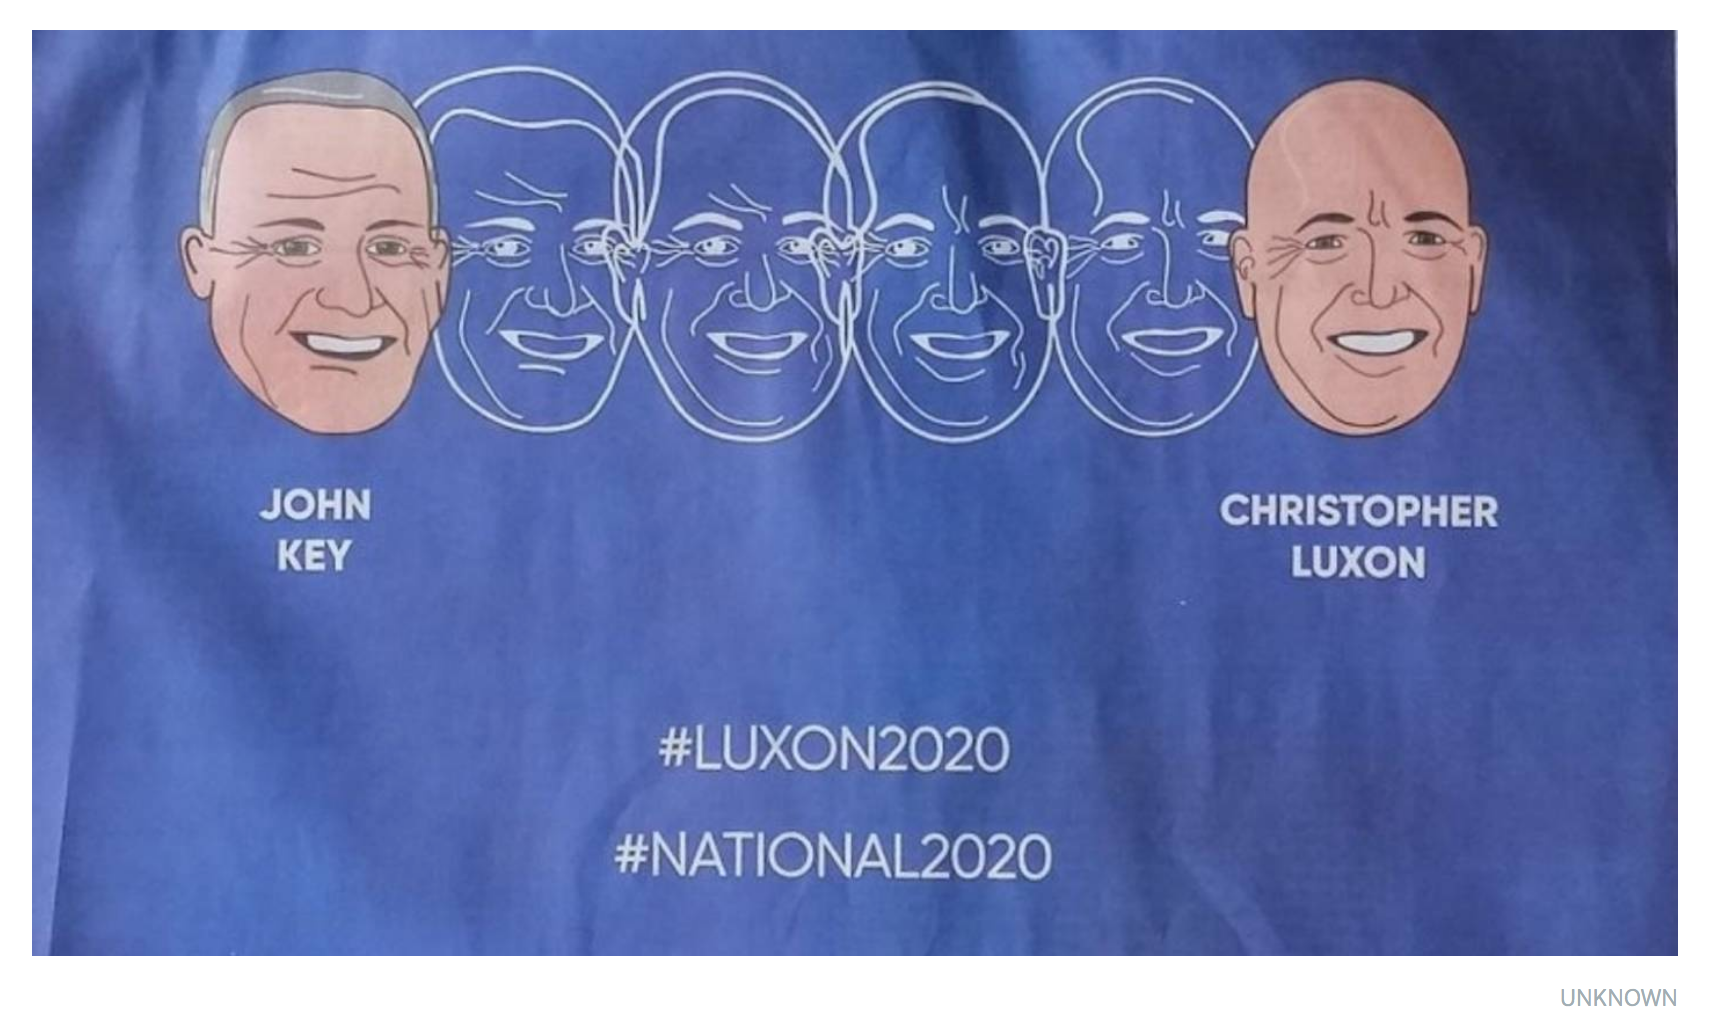 Screenshot taken 08/08/19 from  https://www.stuff.co.nz/national/politics/113728932/luxon-for-national-advertisement-entrepreneurs-remarkable-past